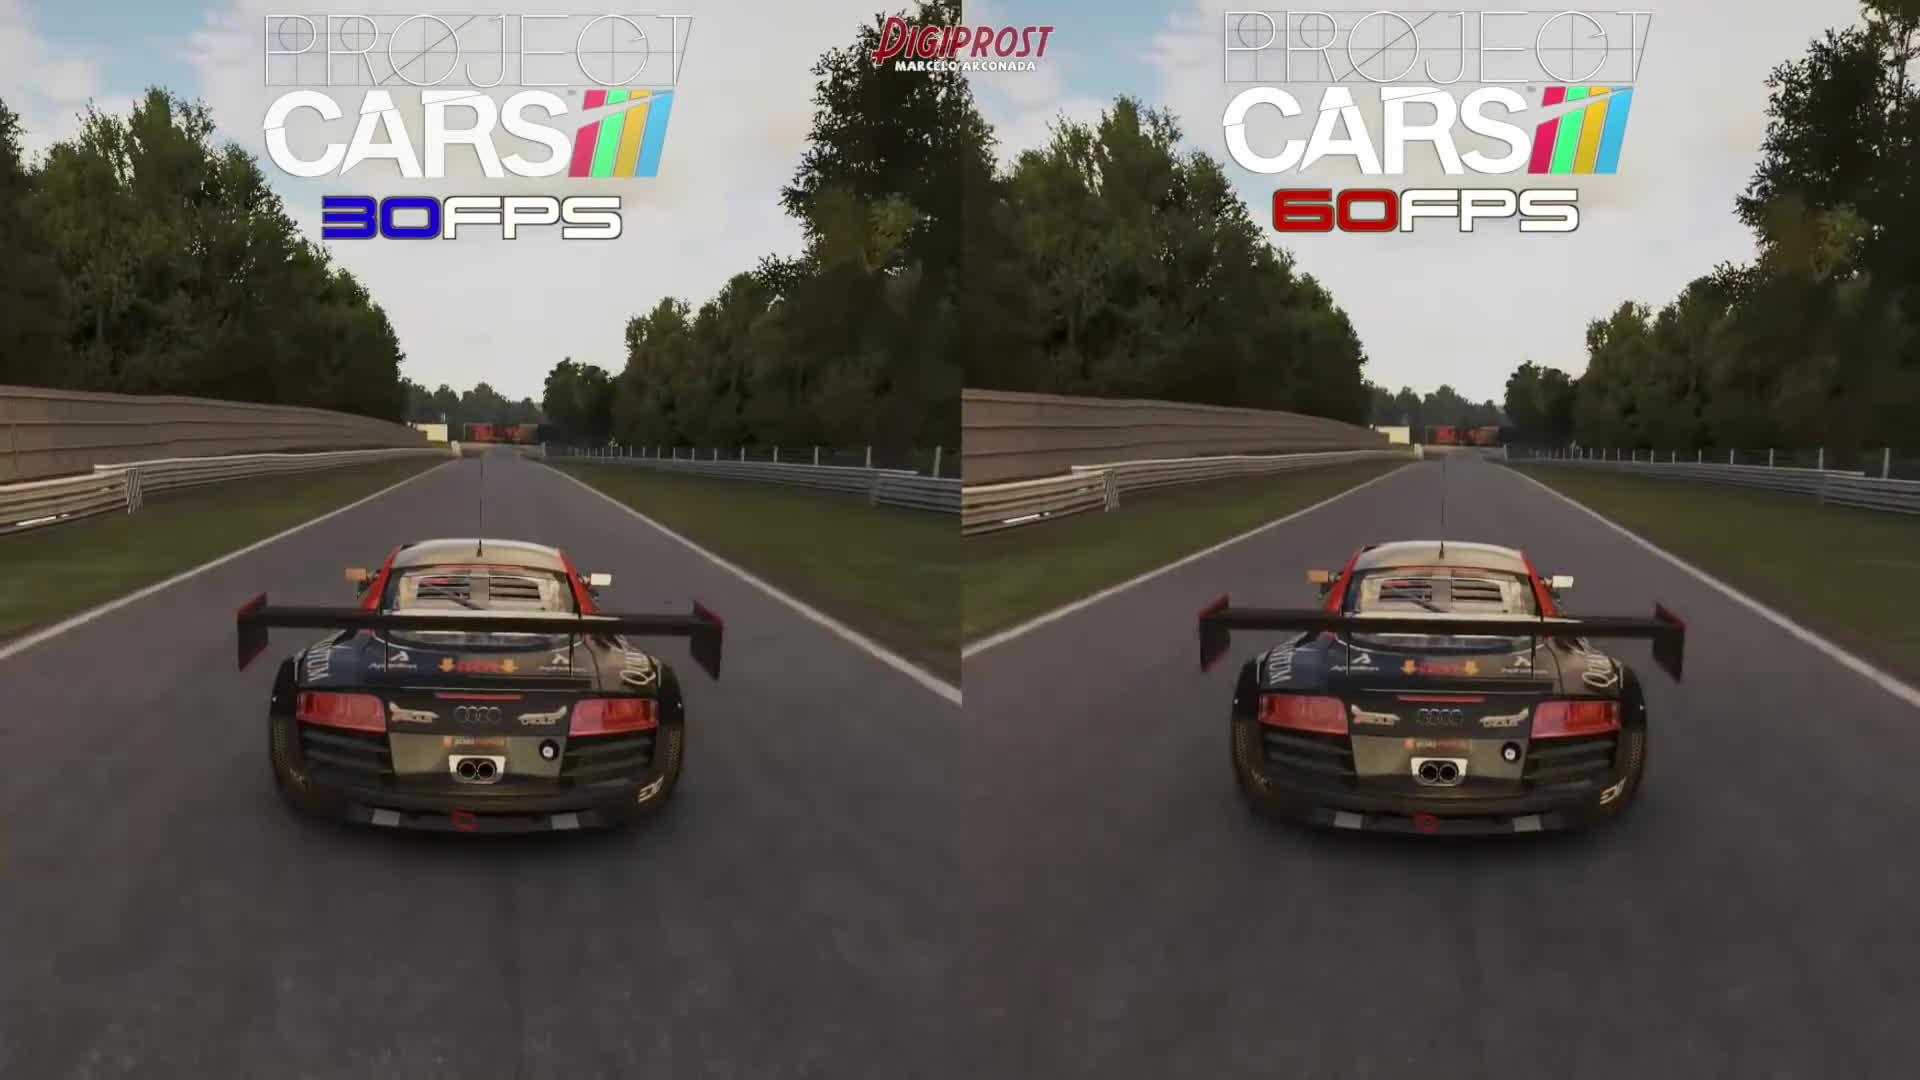 30FPS Vs 60FPS - Project CARS Audi R8 Ultra @ Brands Hatch